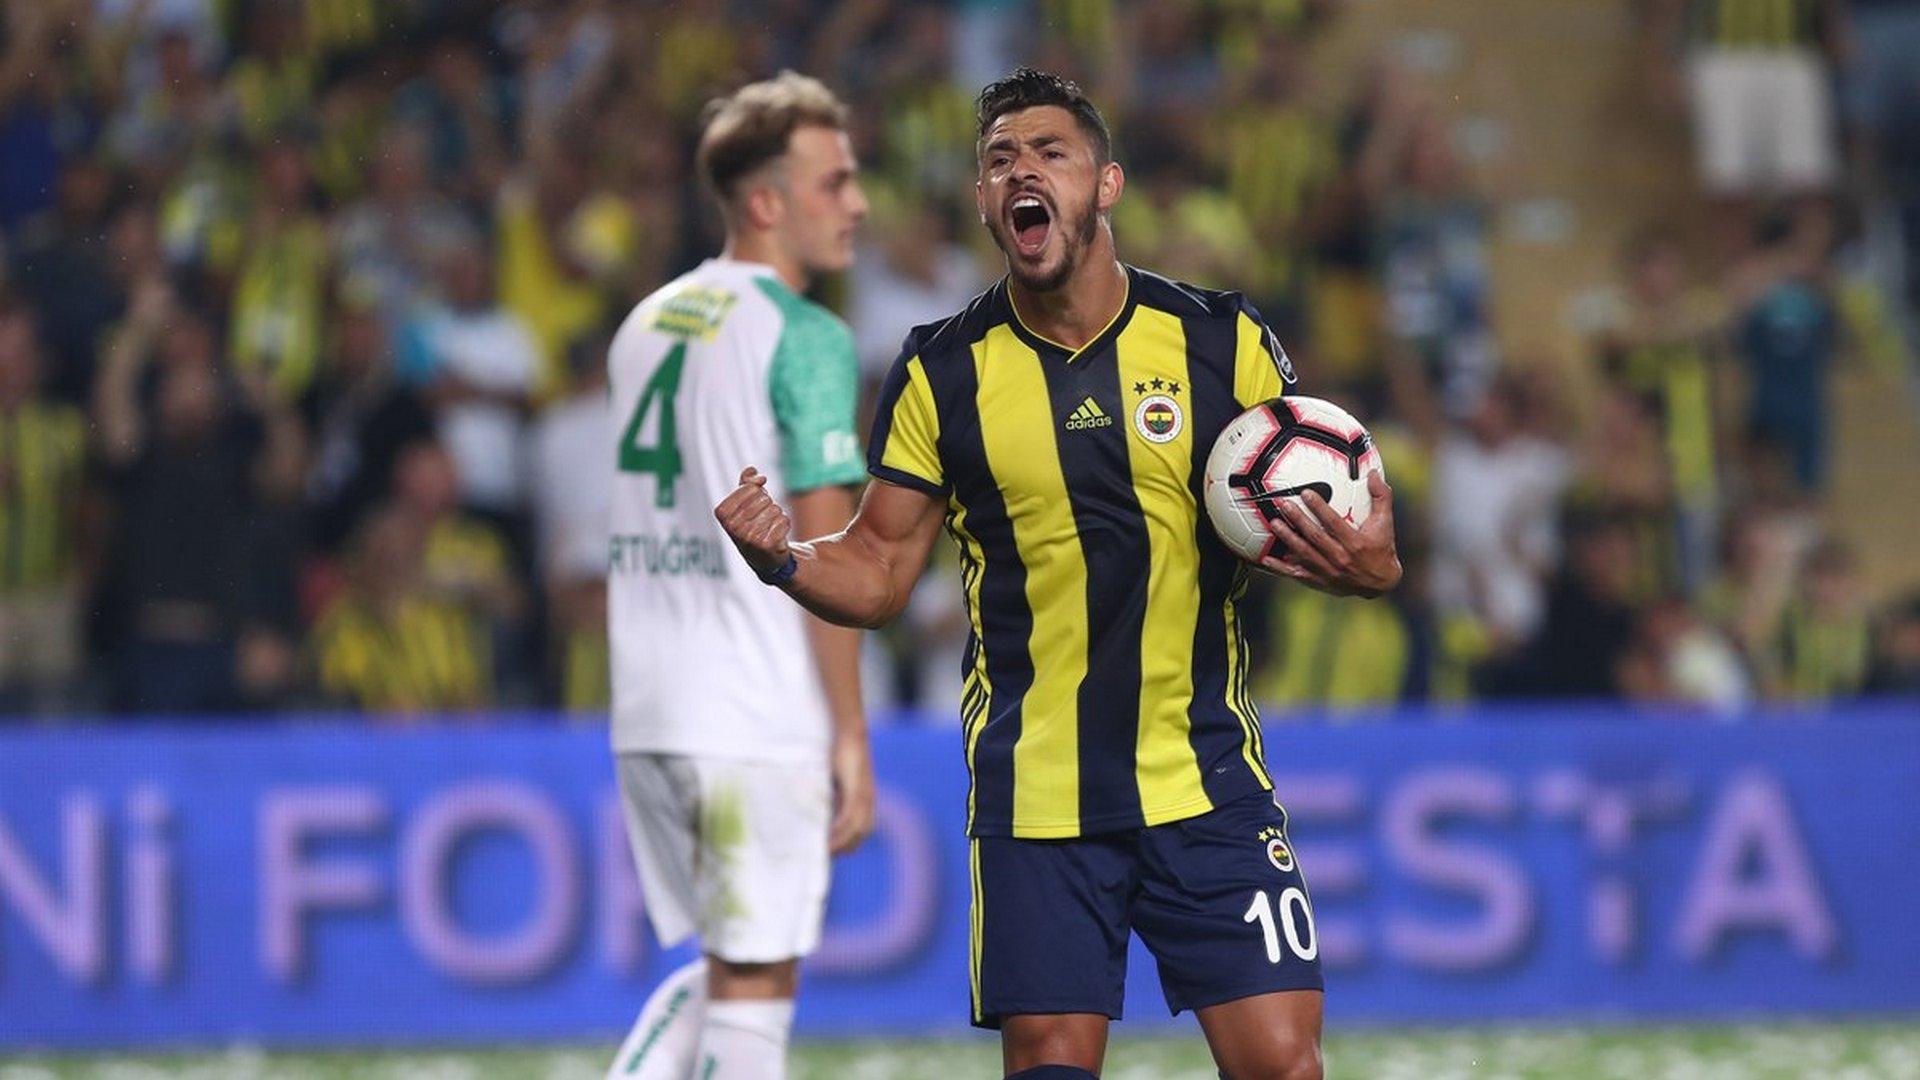 Giuliano Fenerbahce Bursaspor 7112018